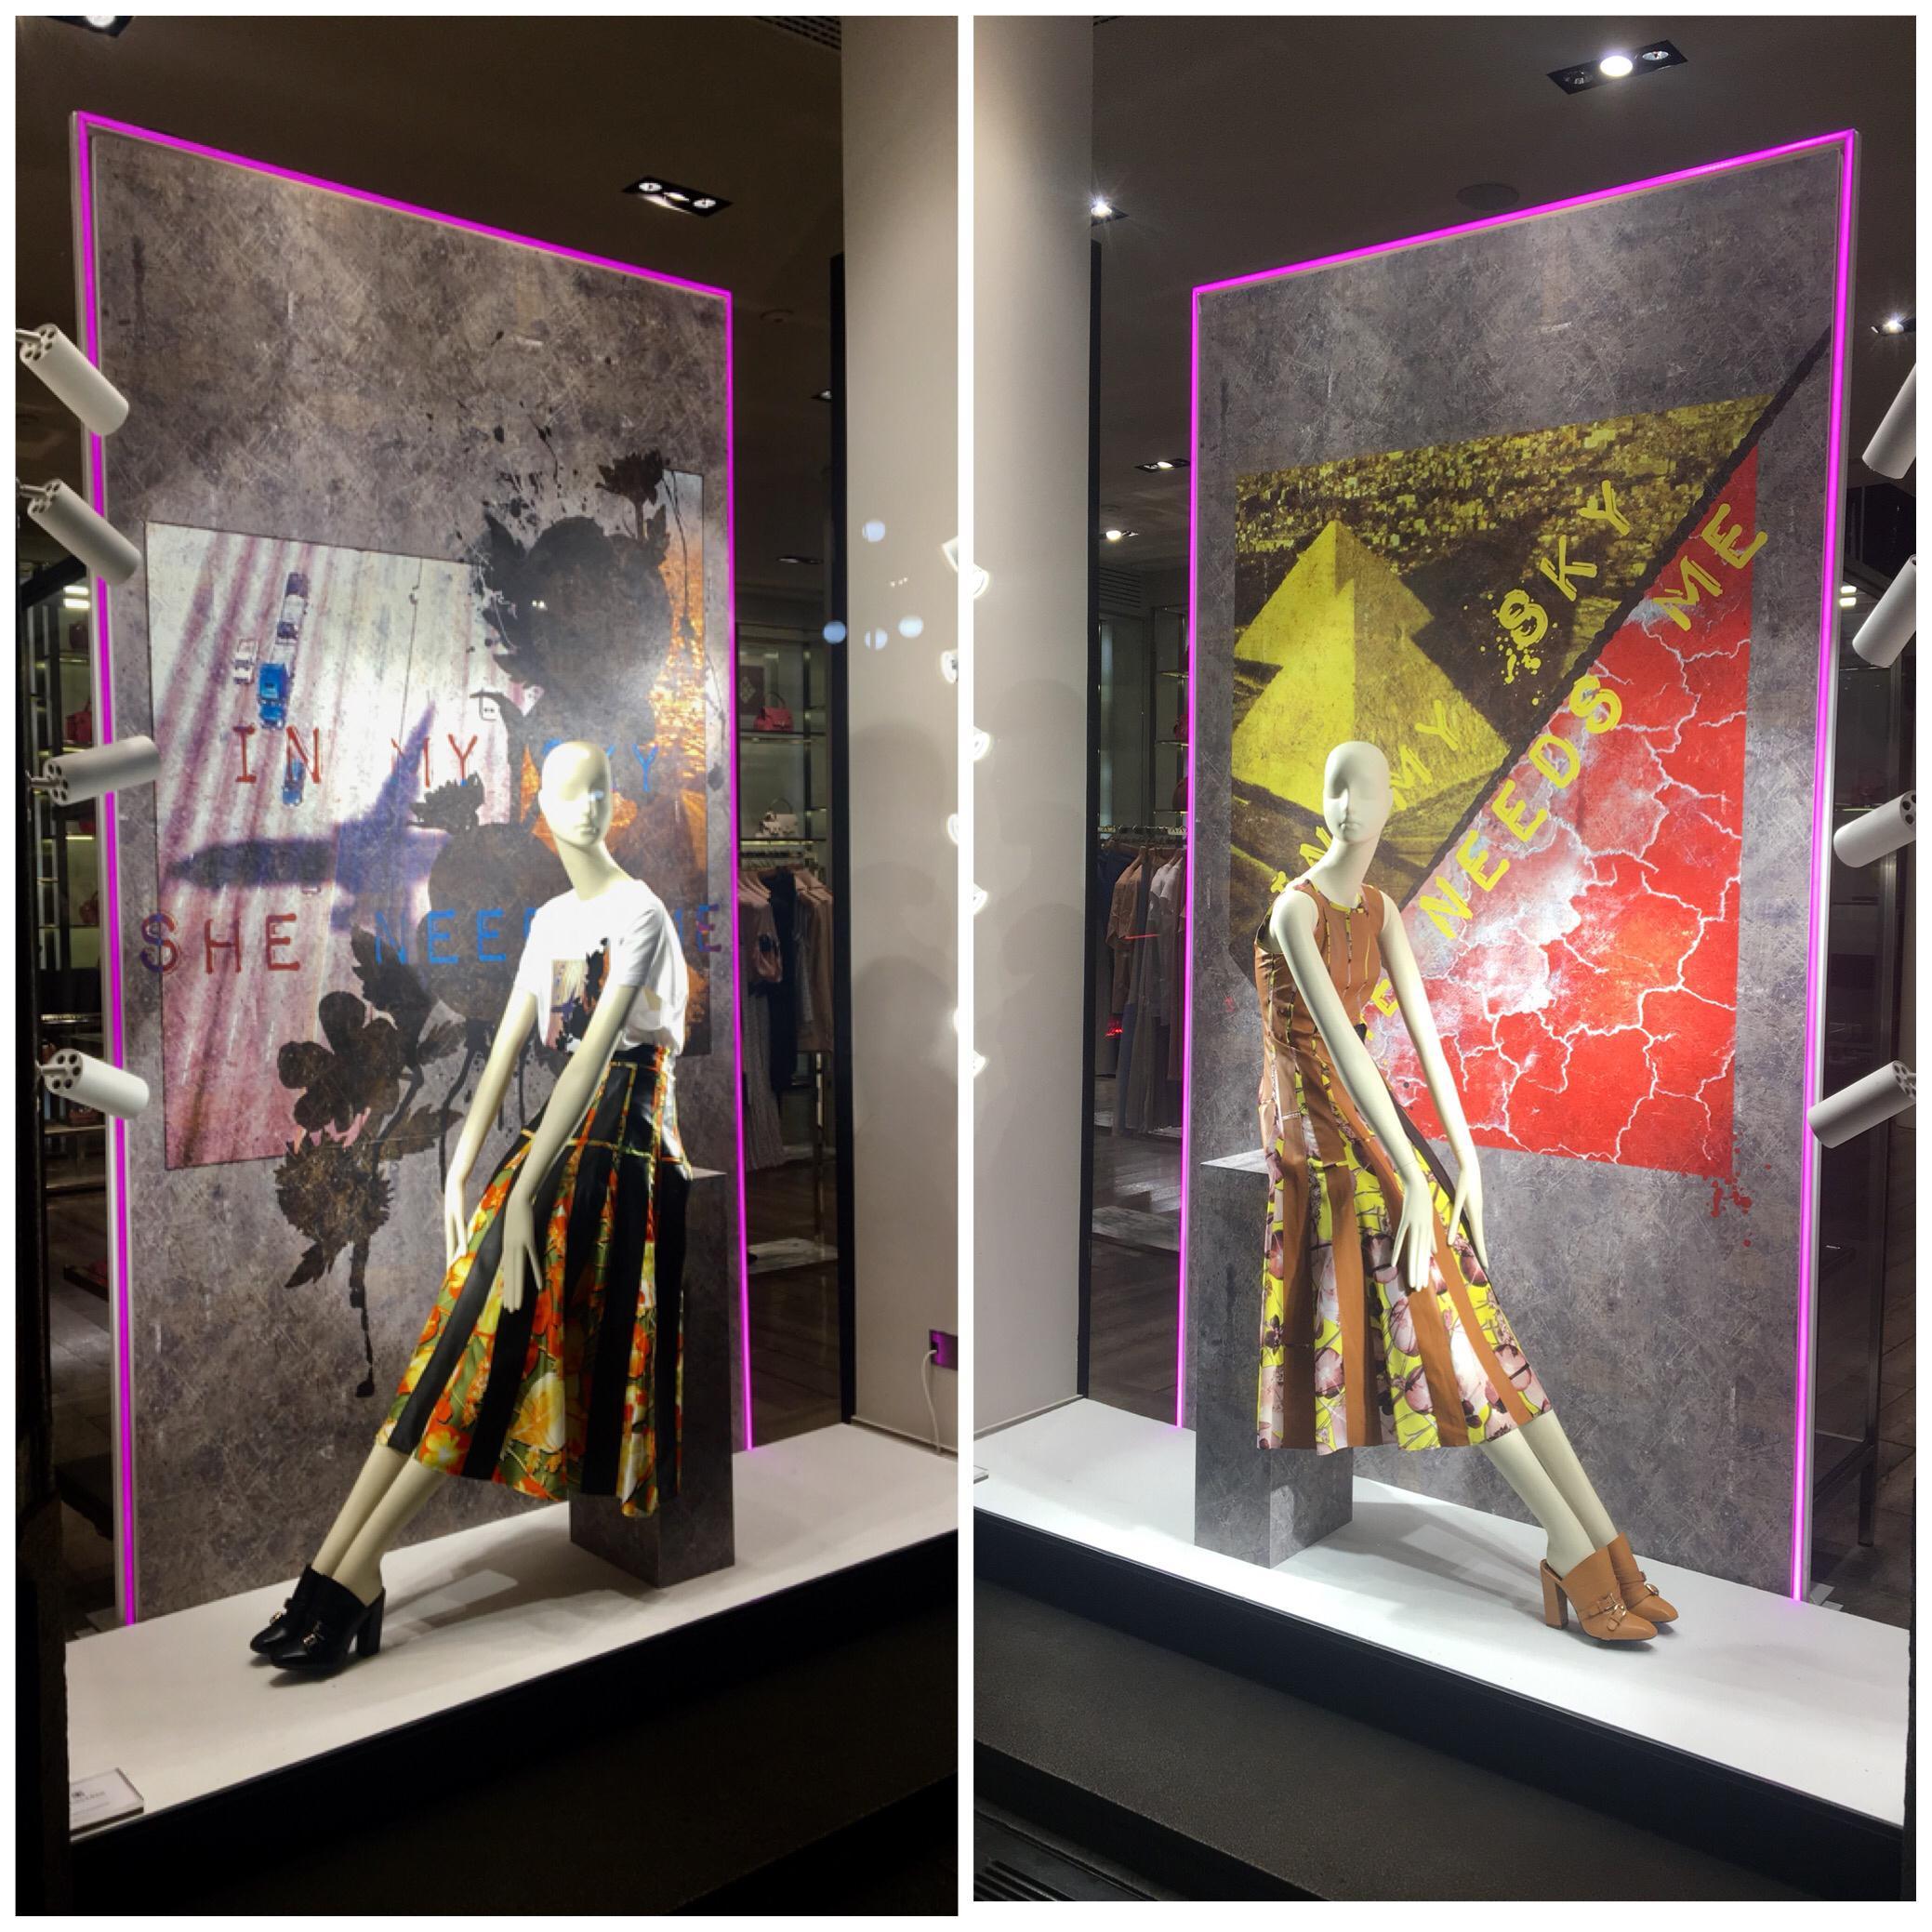 Creative window display for Trussardi SS2018 by the Visual Merchandising team under Maurizio Vasile